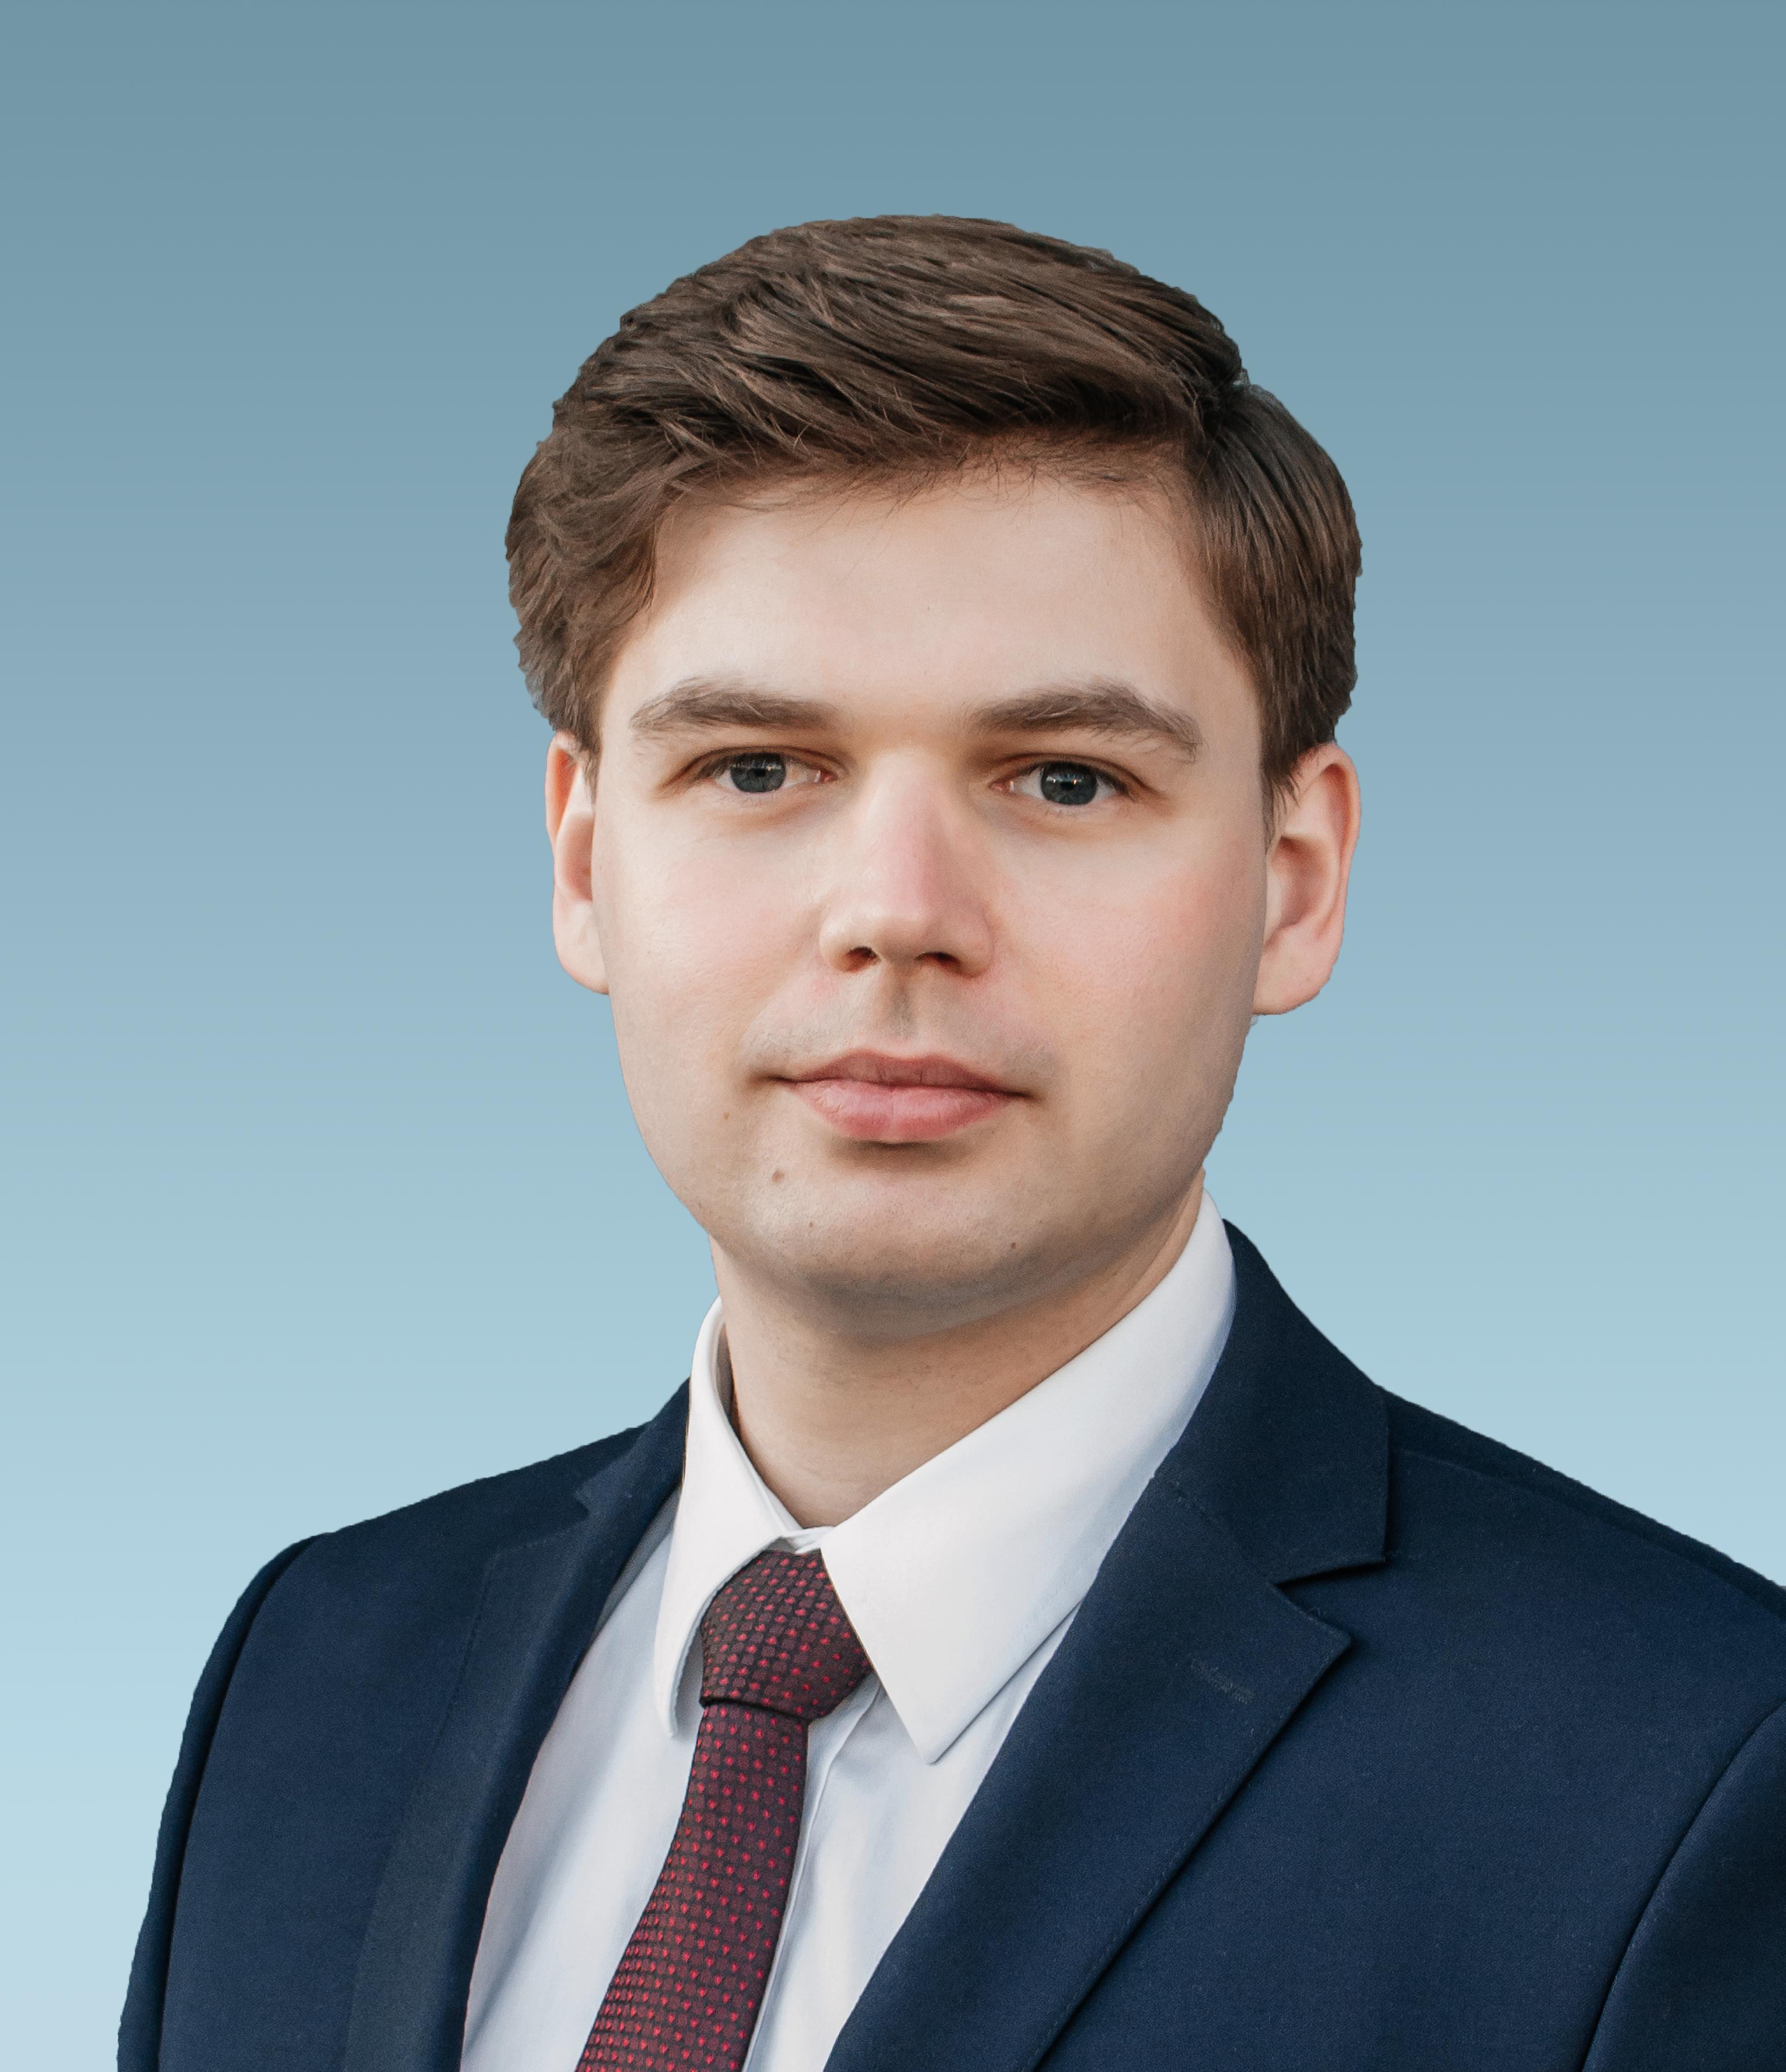 ANTON NAVITSKI